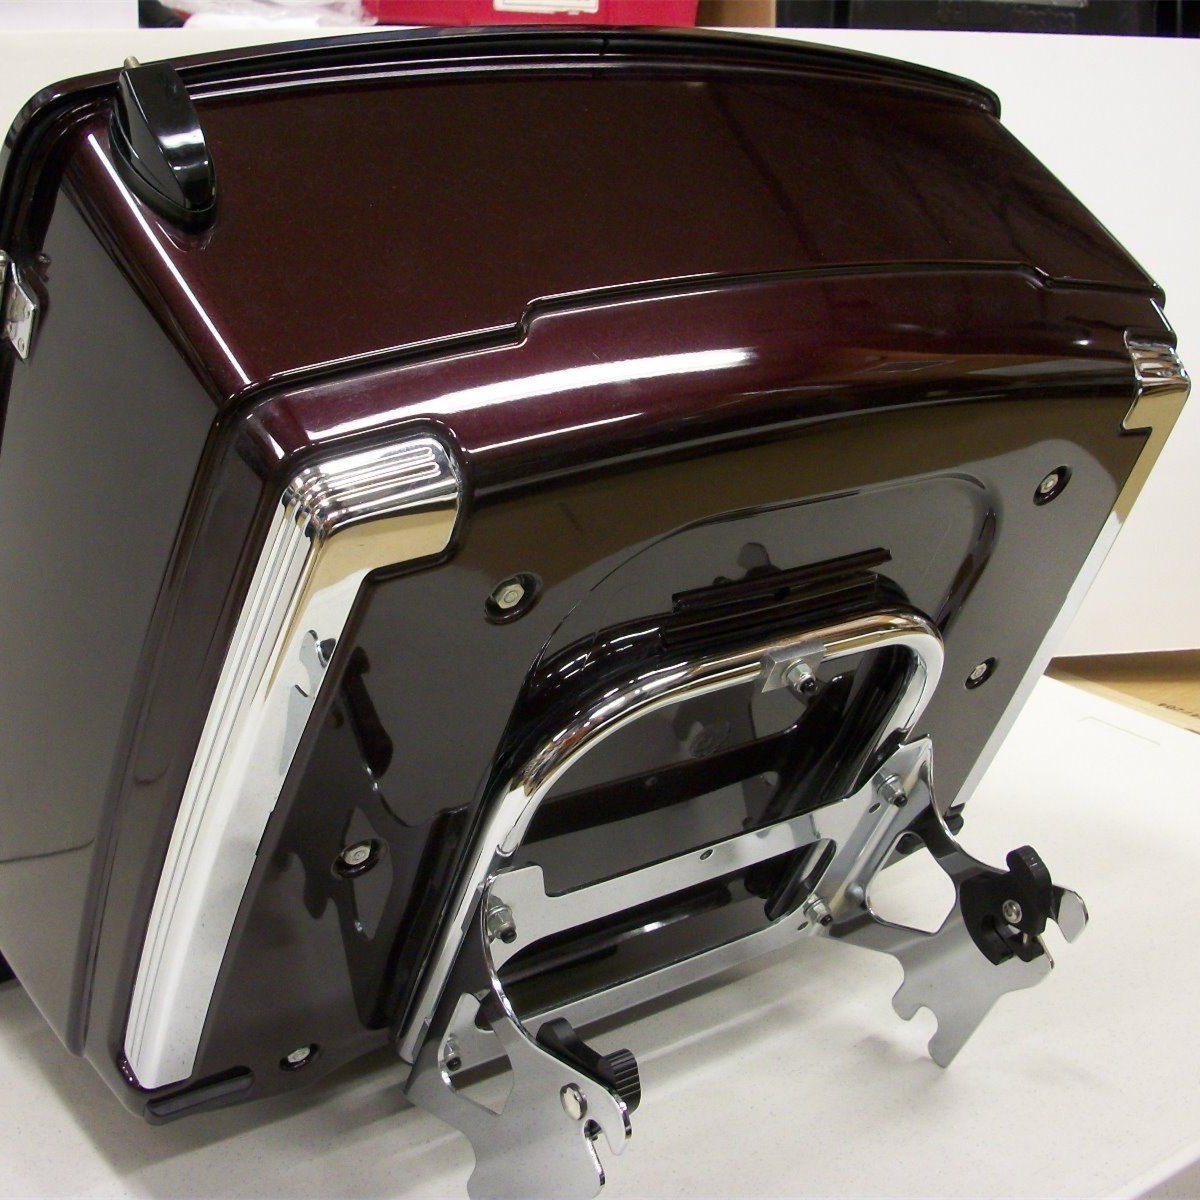 97-08 Detachable Two-up Tour Pack Mounting Luggage Rack W//Docking Hardware Kit